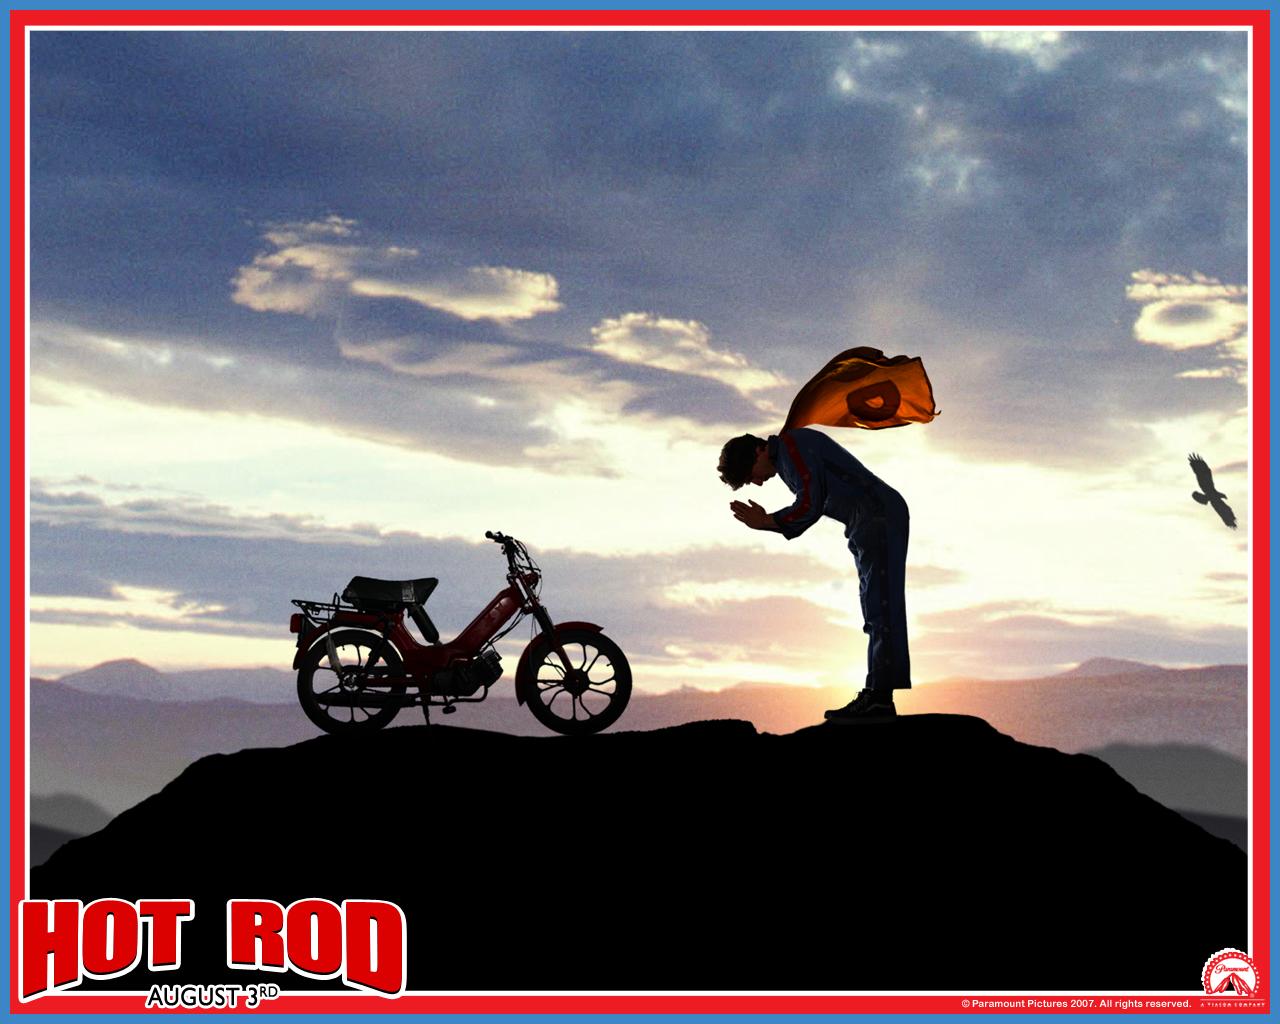 Hot Rod 2007 Movie Poster - HD Wallpaper